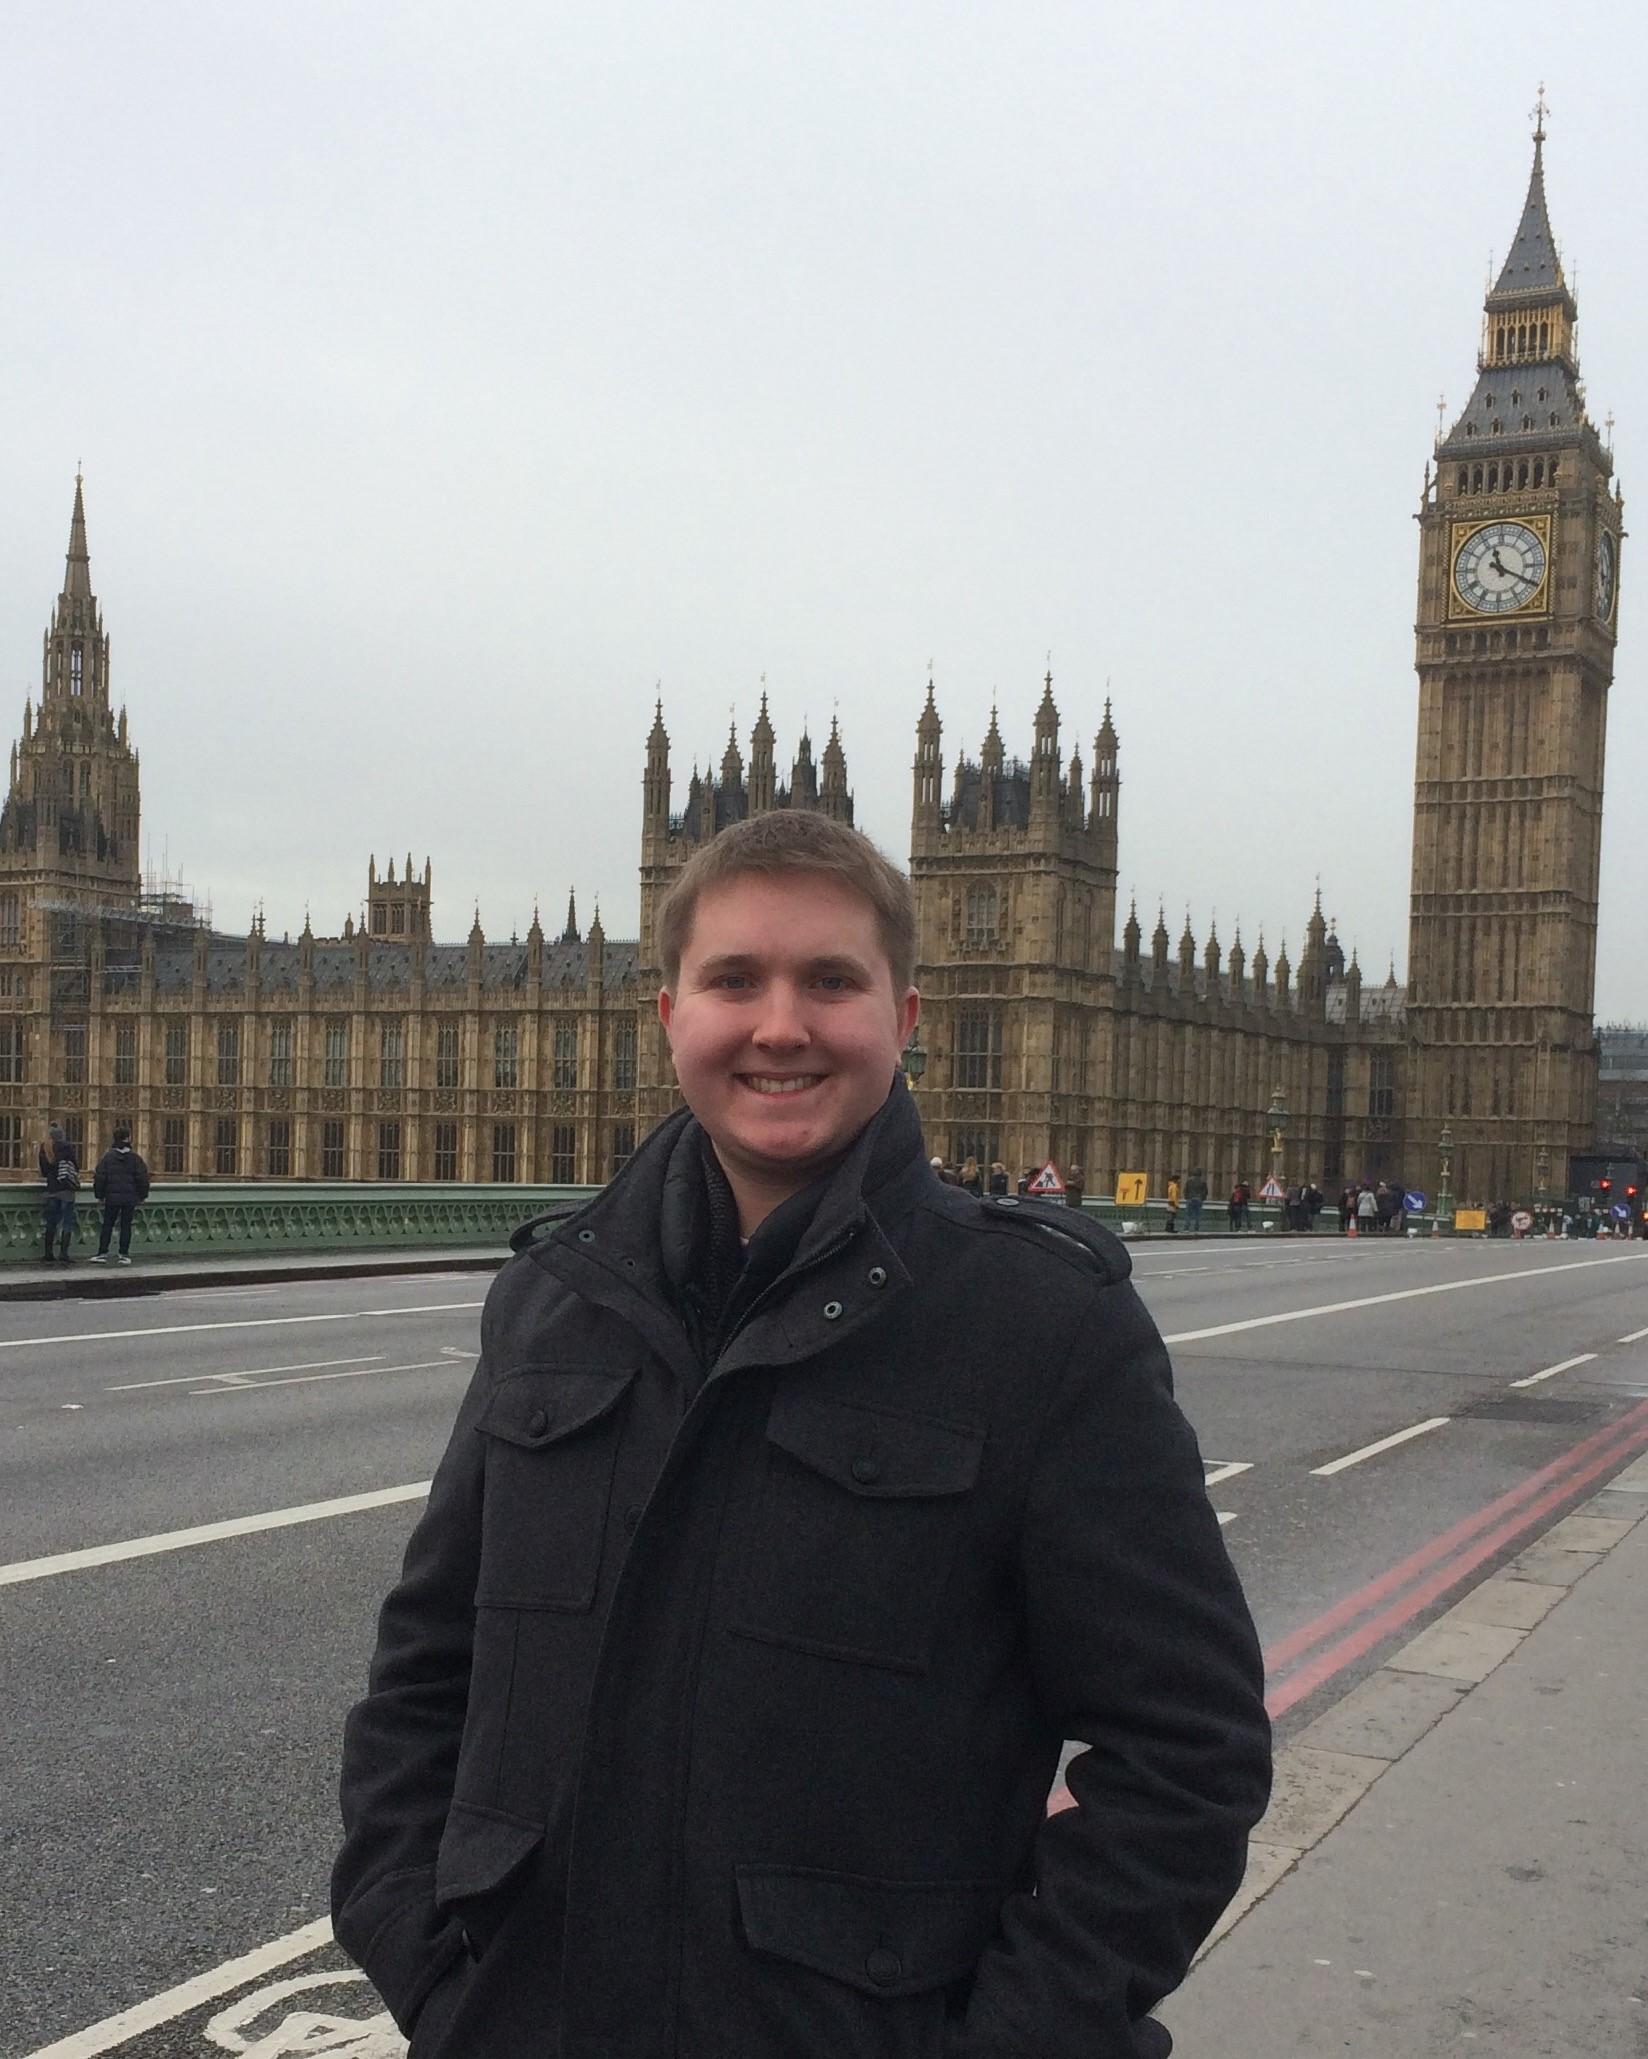 CAPAStudyAbroad_London_Spring2016_From_Samson_Cassel_Nucci_-_Parliment.jpg